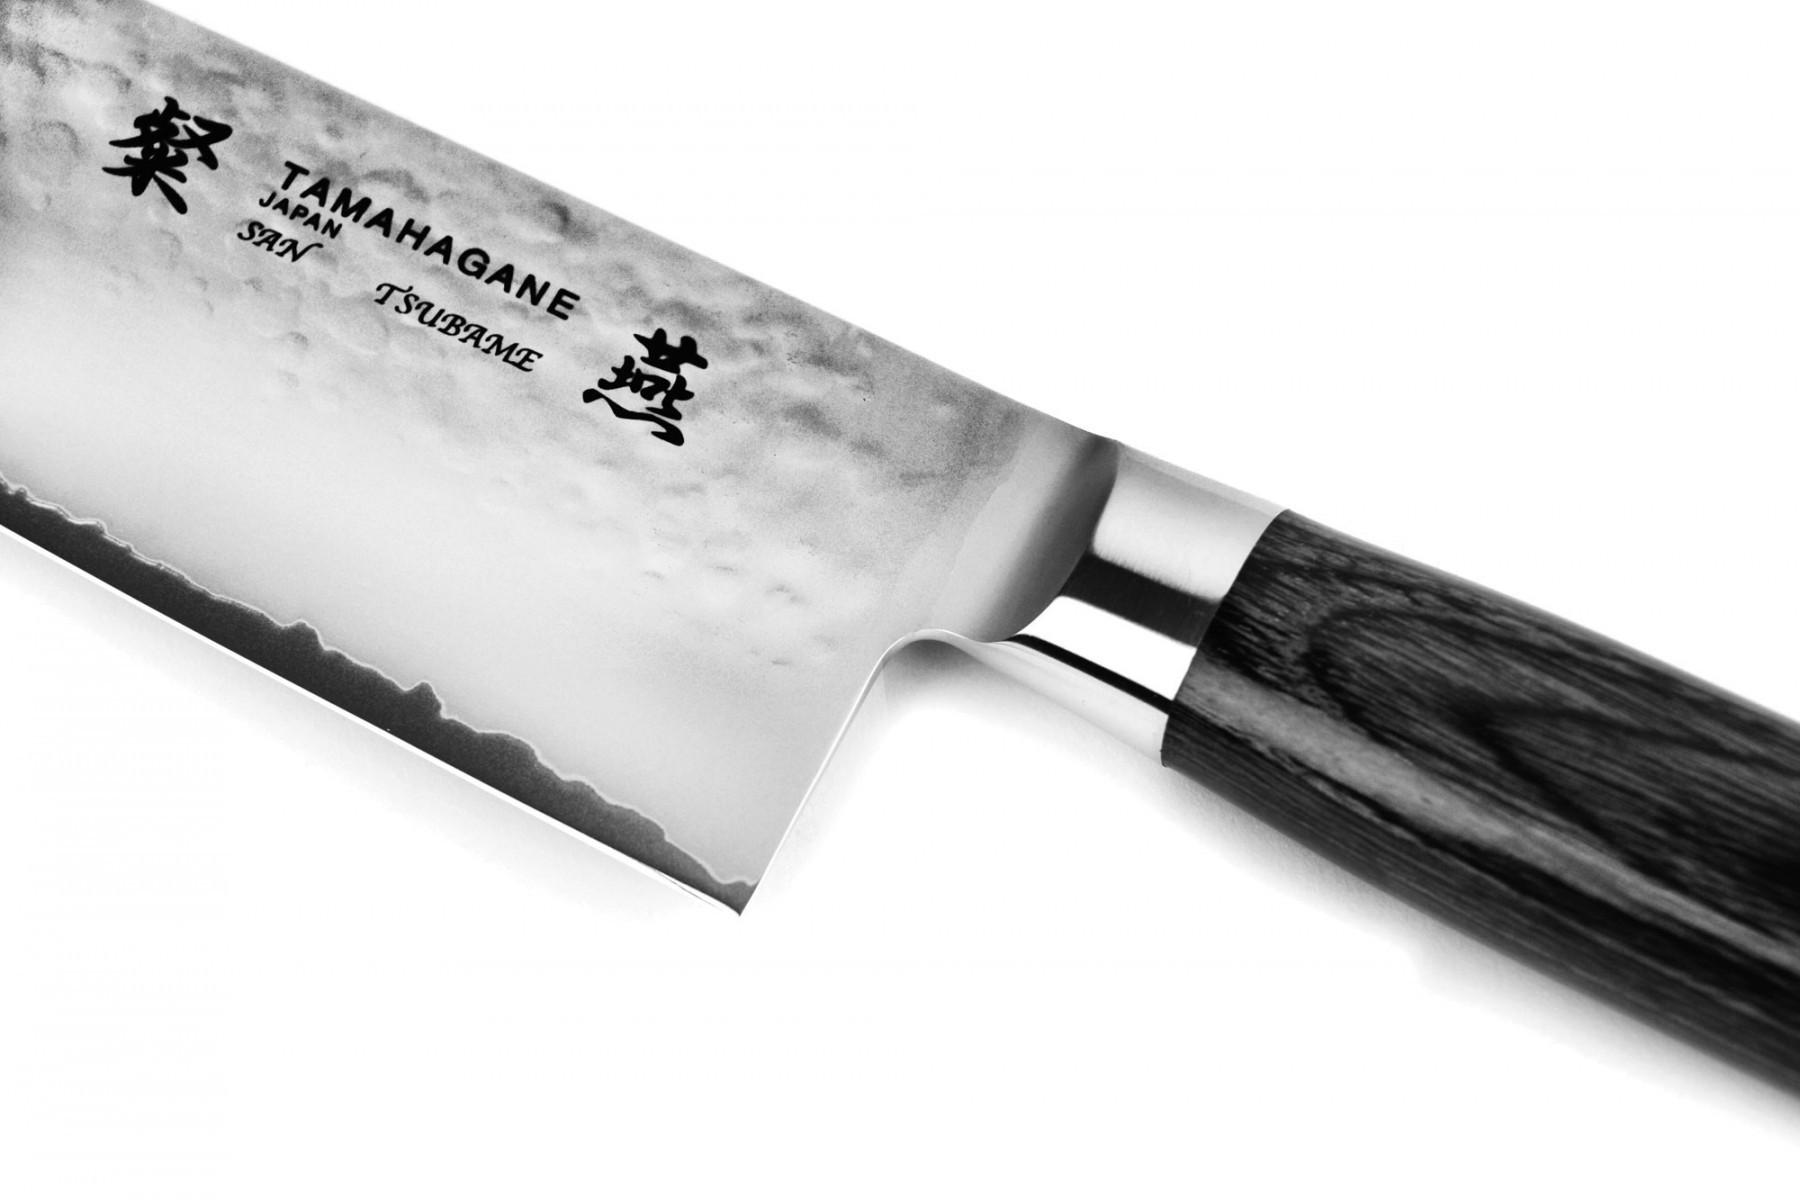 tamahagane san tsubame chef u0027s starter knife set kitchenknives co uk